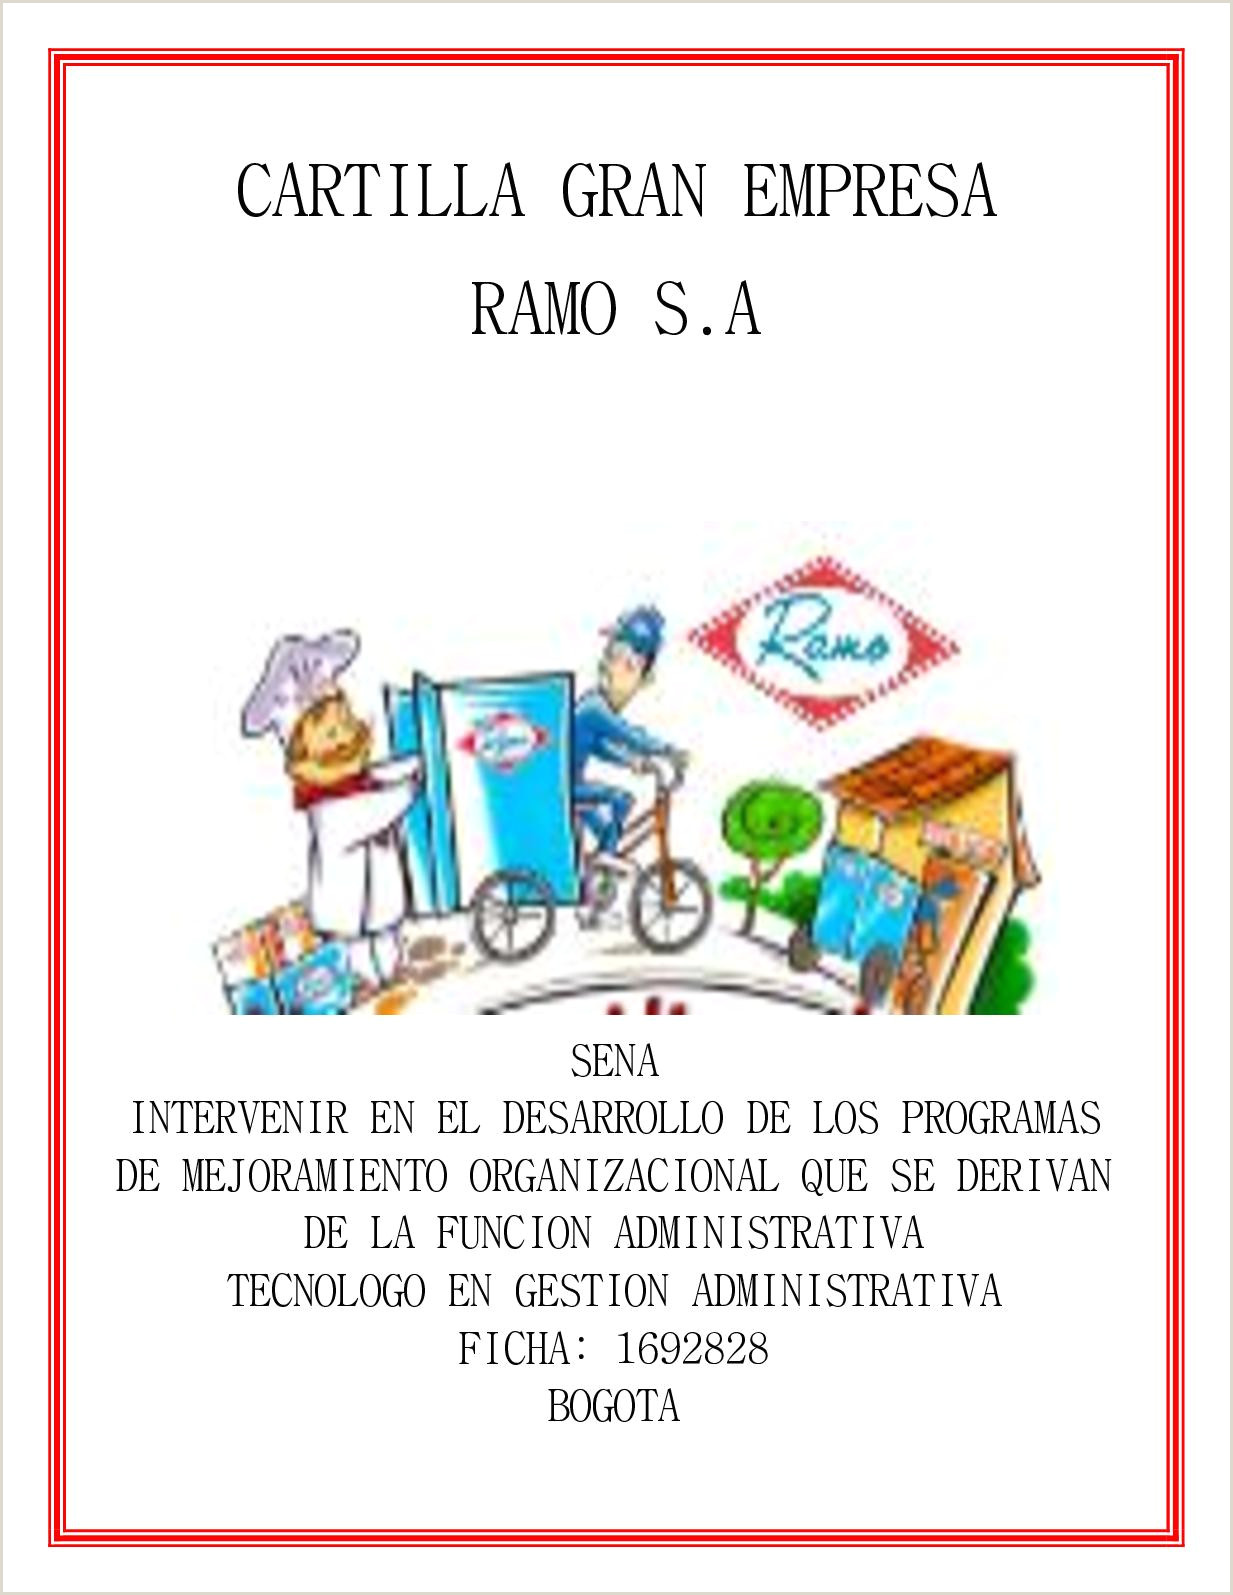 Formato Hoja De Vida Sena Gestion Administrativa Calameo Downloader